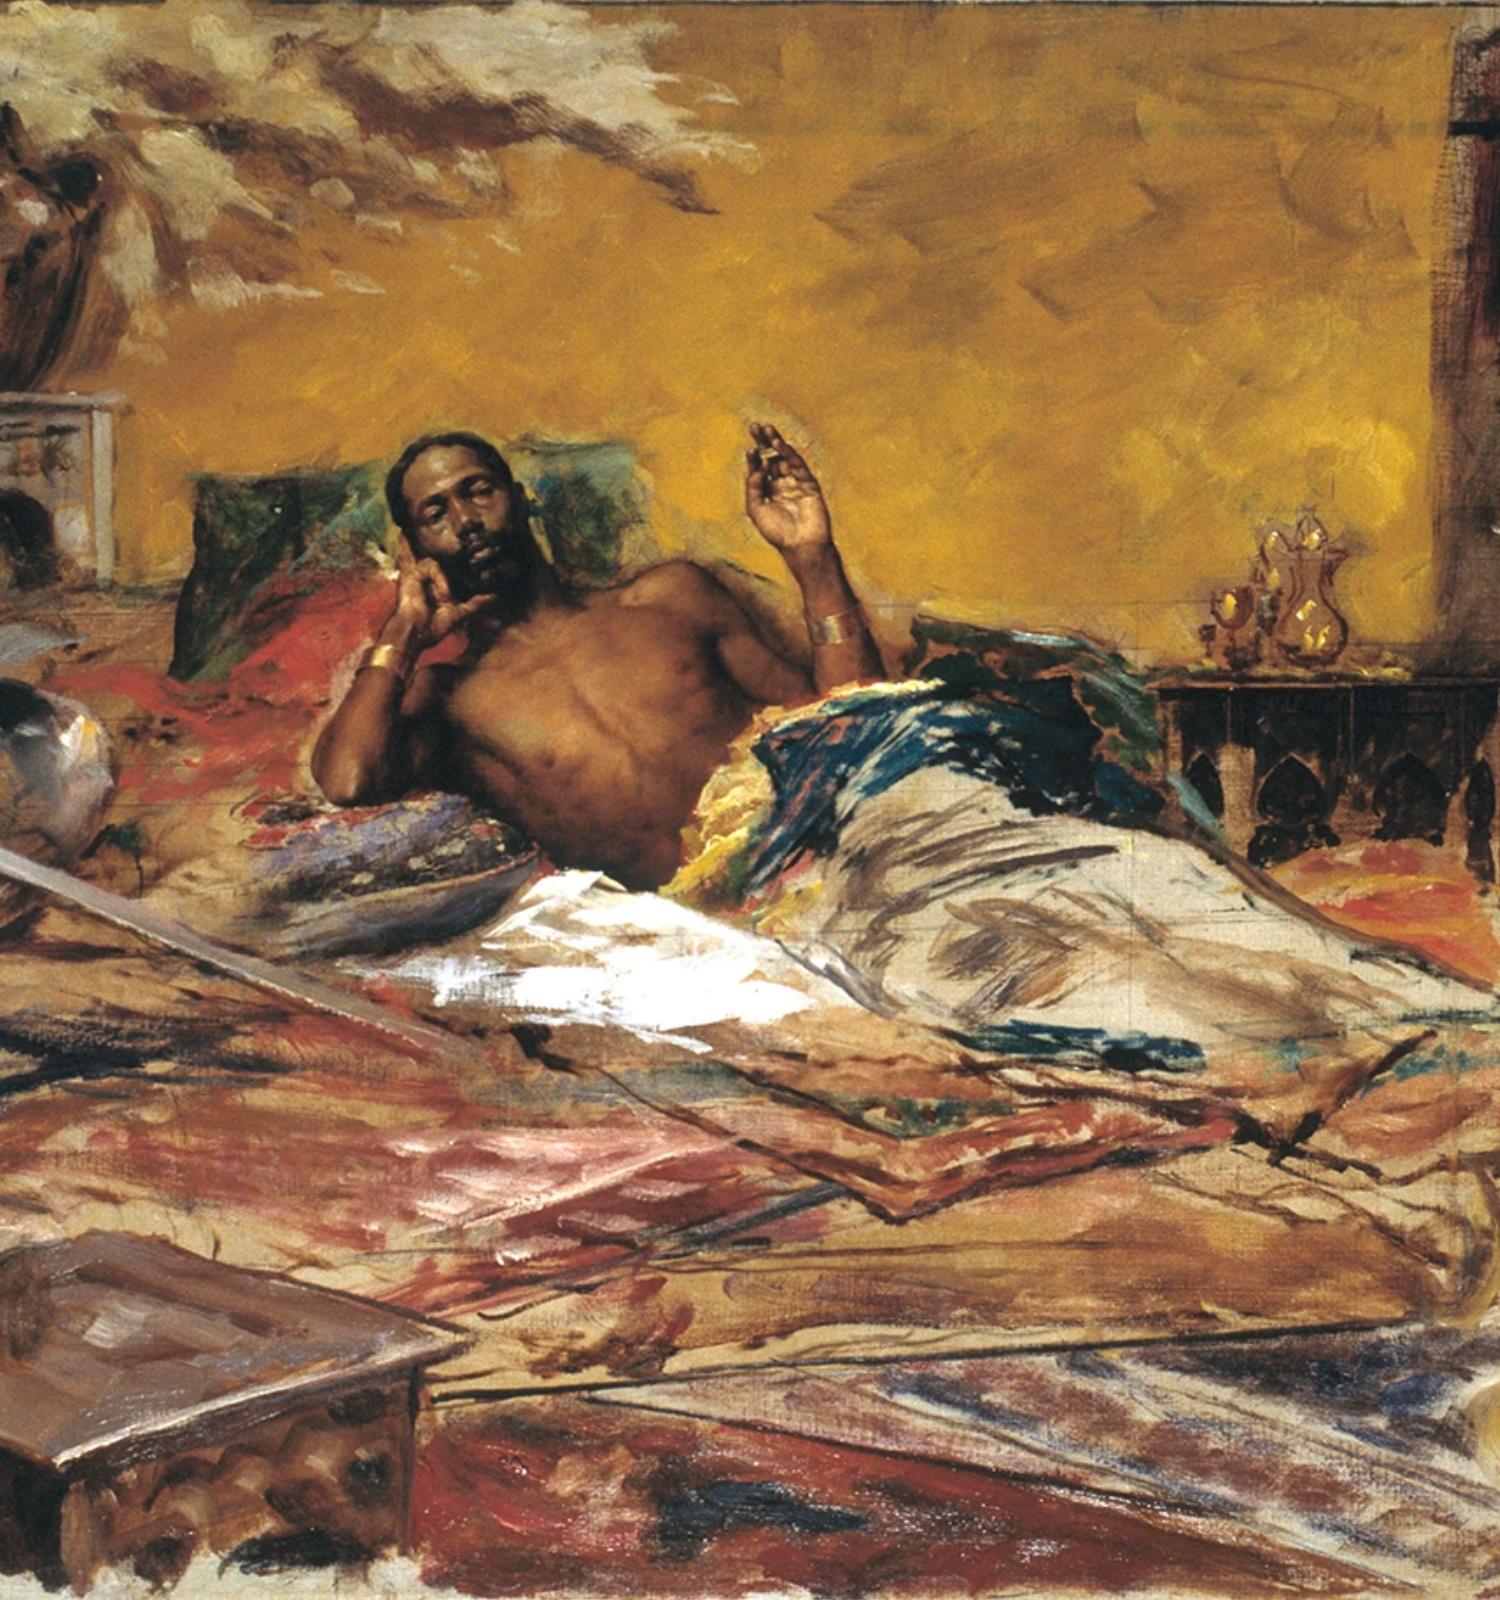 Reposo del guerrero (detalle), Antoni Fabrés, 1878